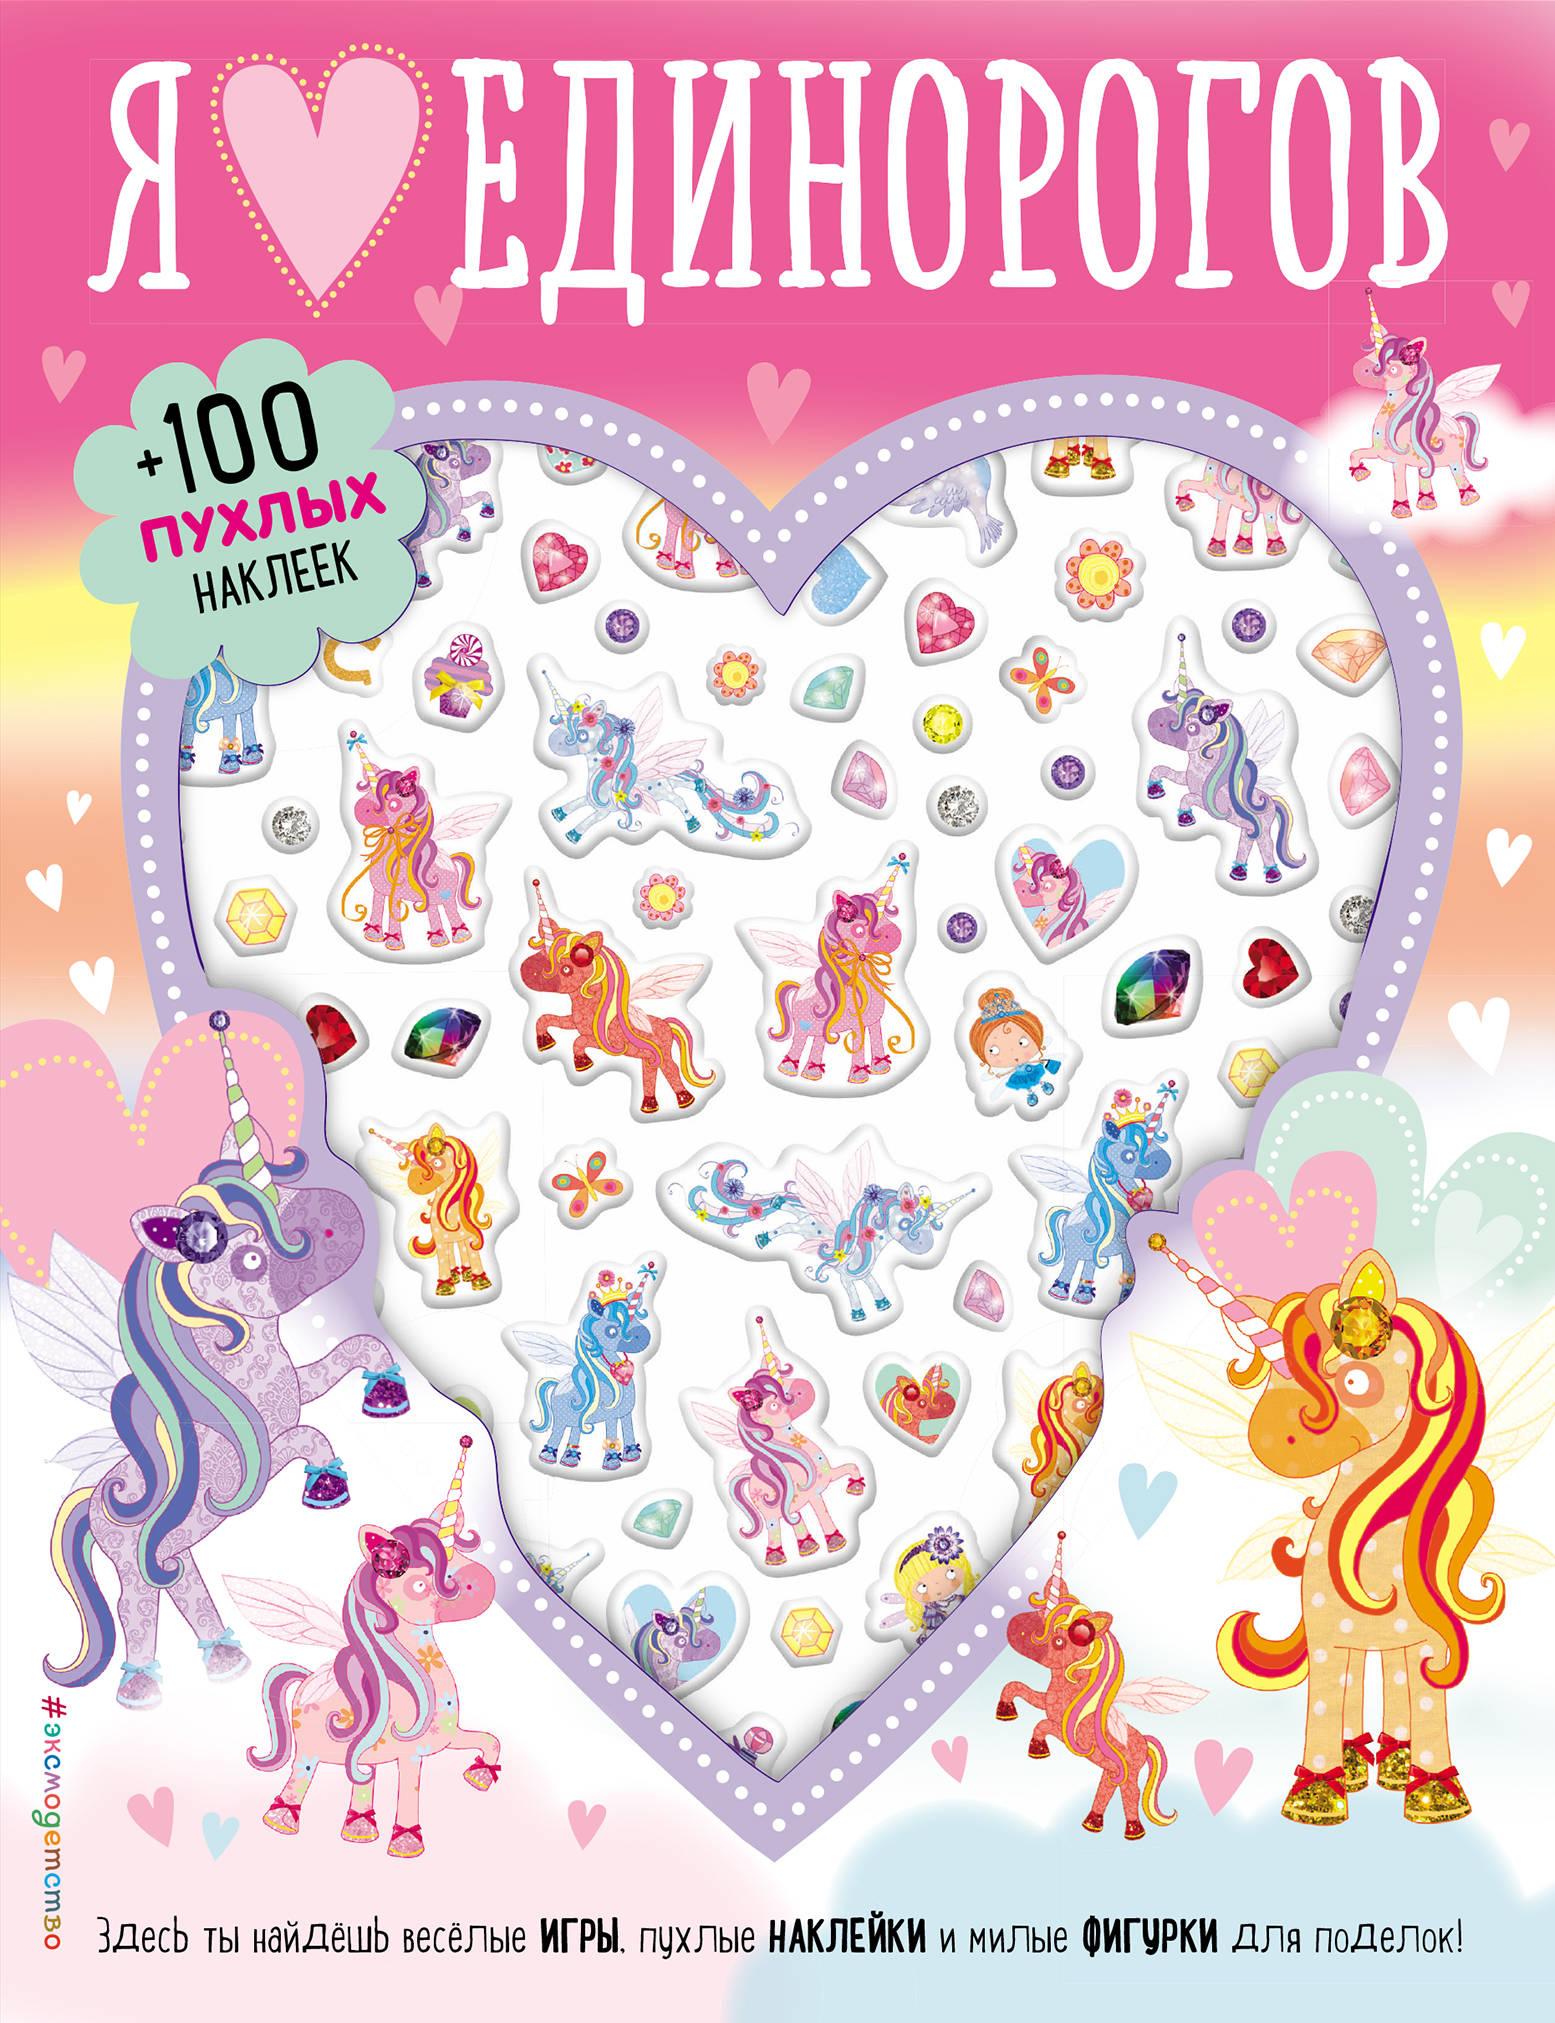 М. Д. Карманова Я люблю единорогов (+100 пухлых наклеек)